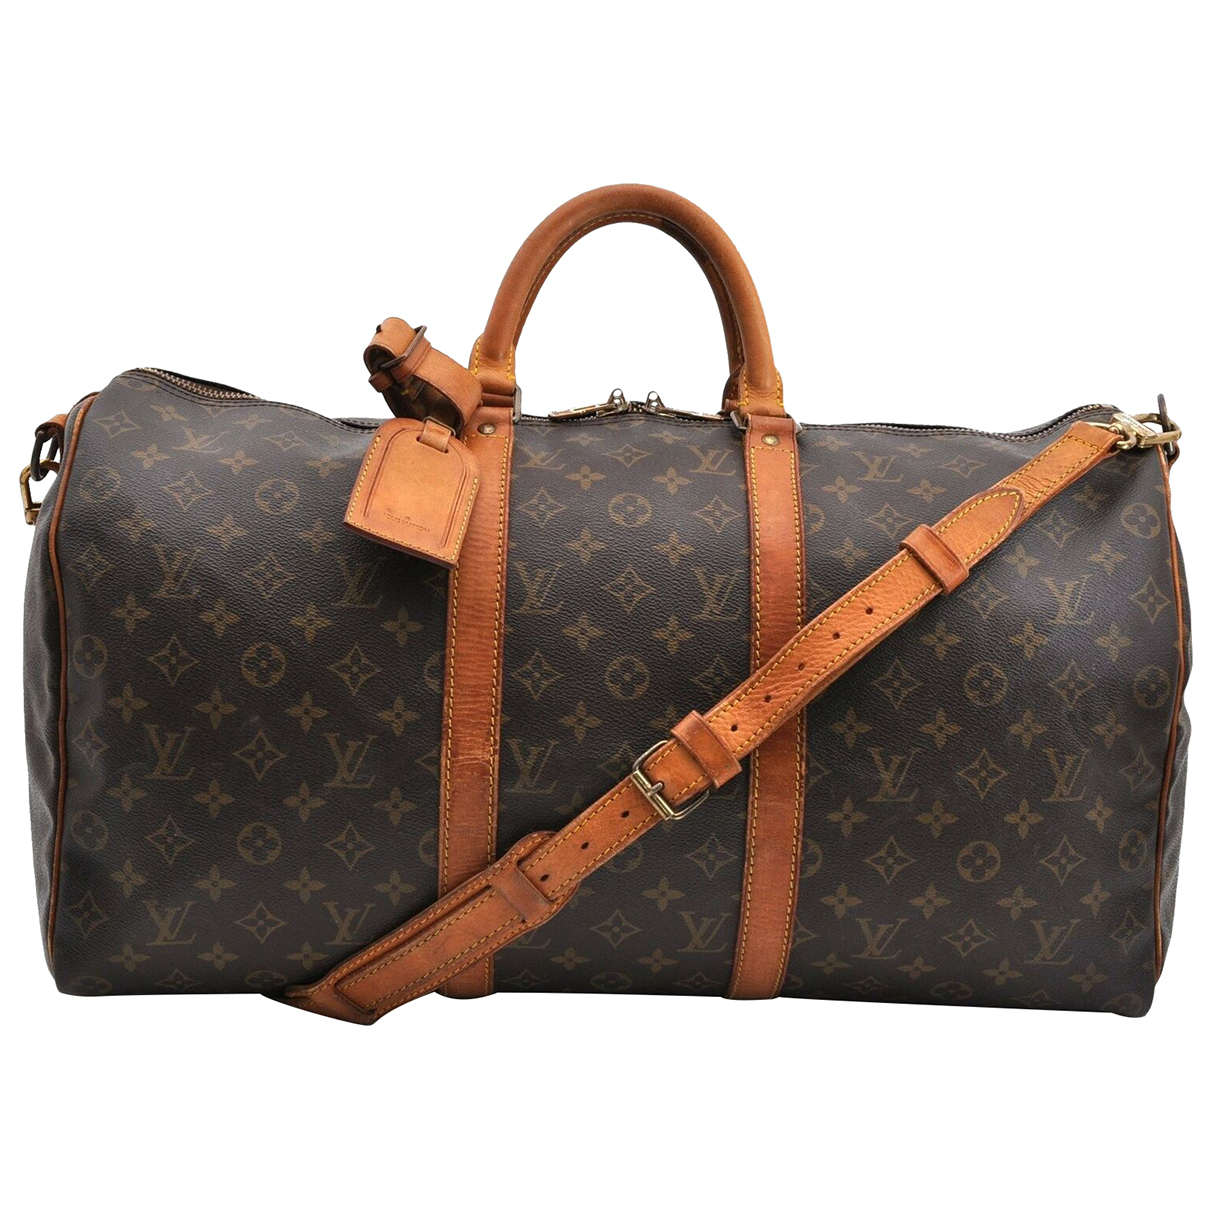 Bolso de viaje Keepall de Lona Louis Vuitton